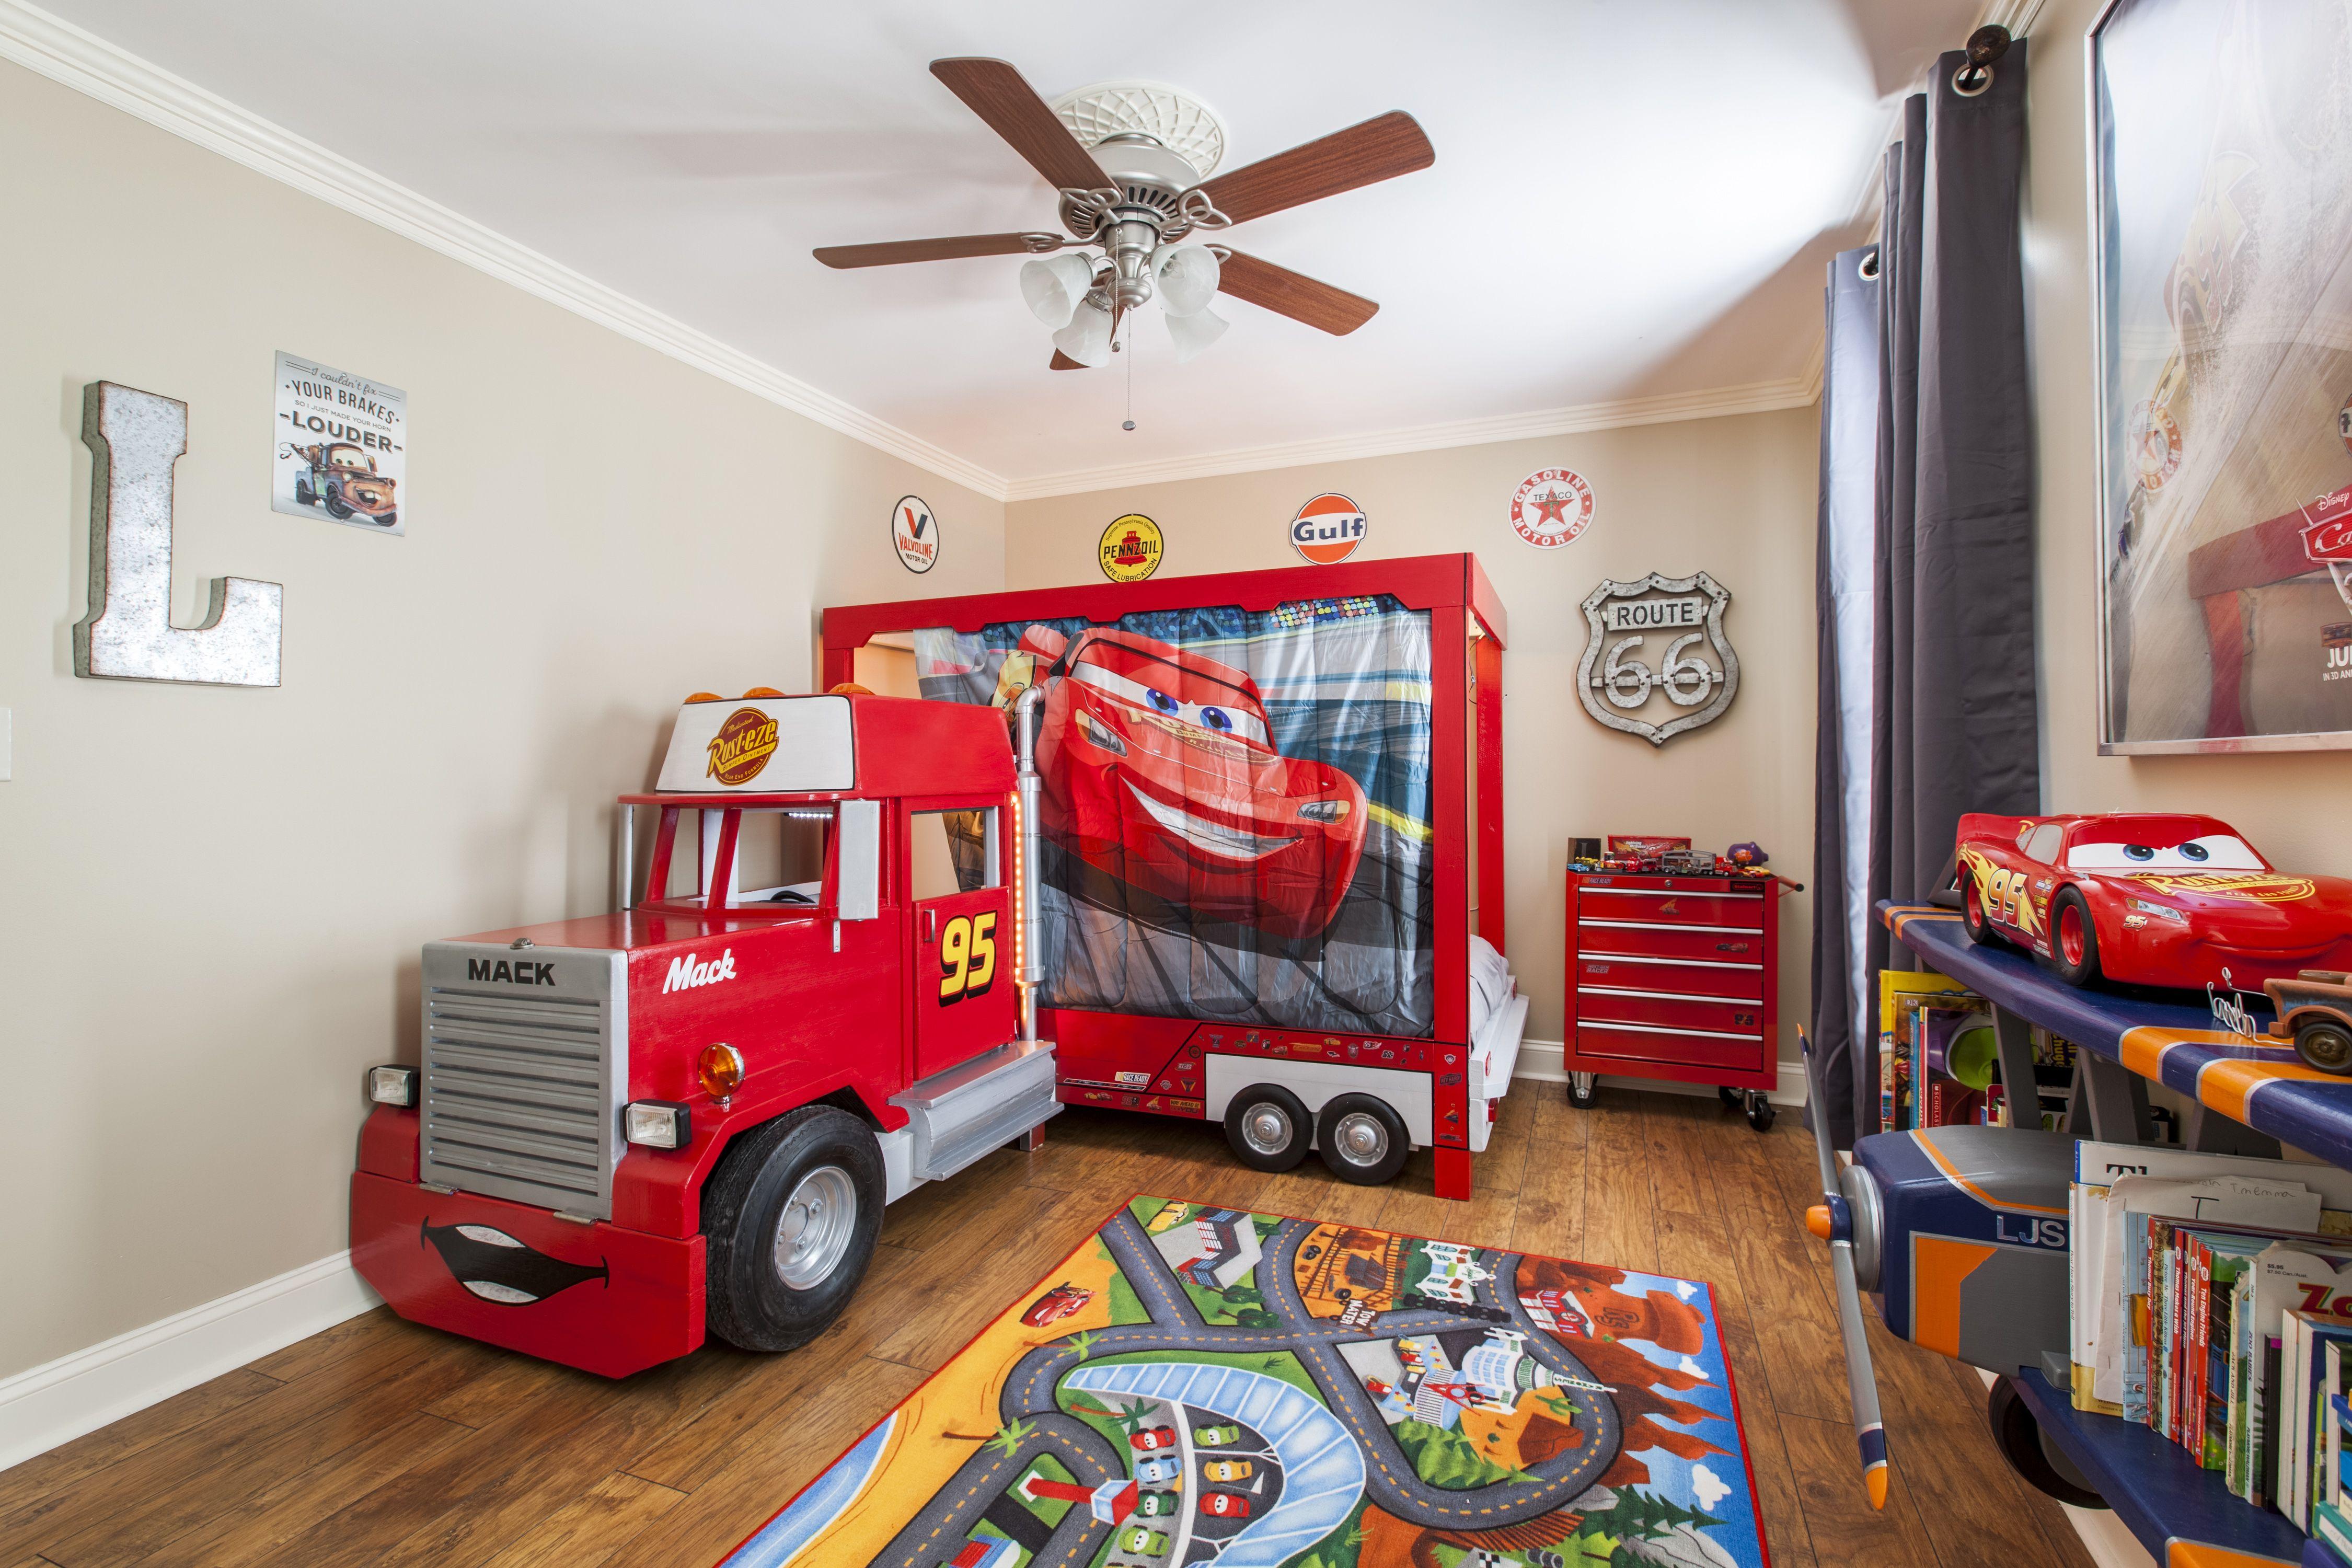 buy online 905fe c519a Disney CARS Mack Truck Toddler Bed. | Griff Toddler Room in ...